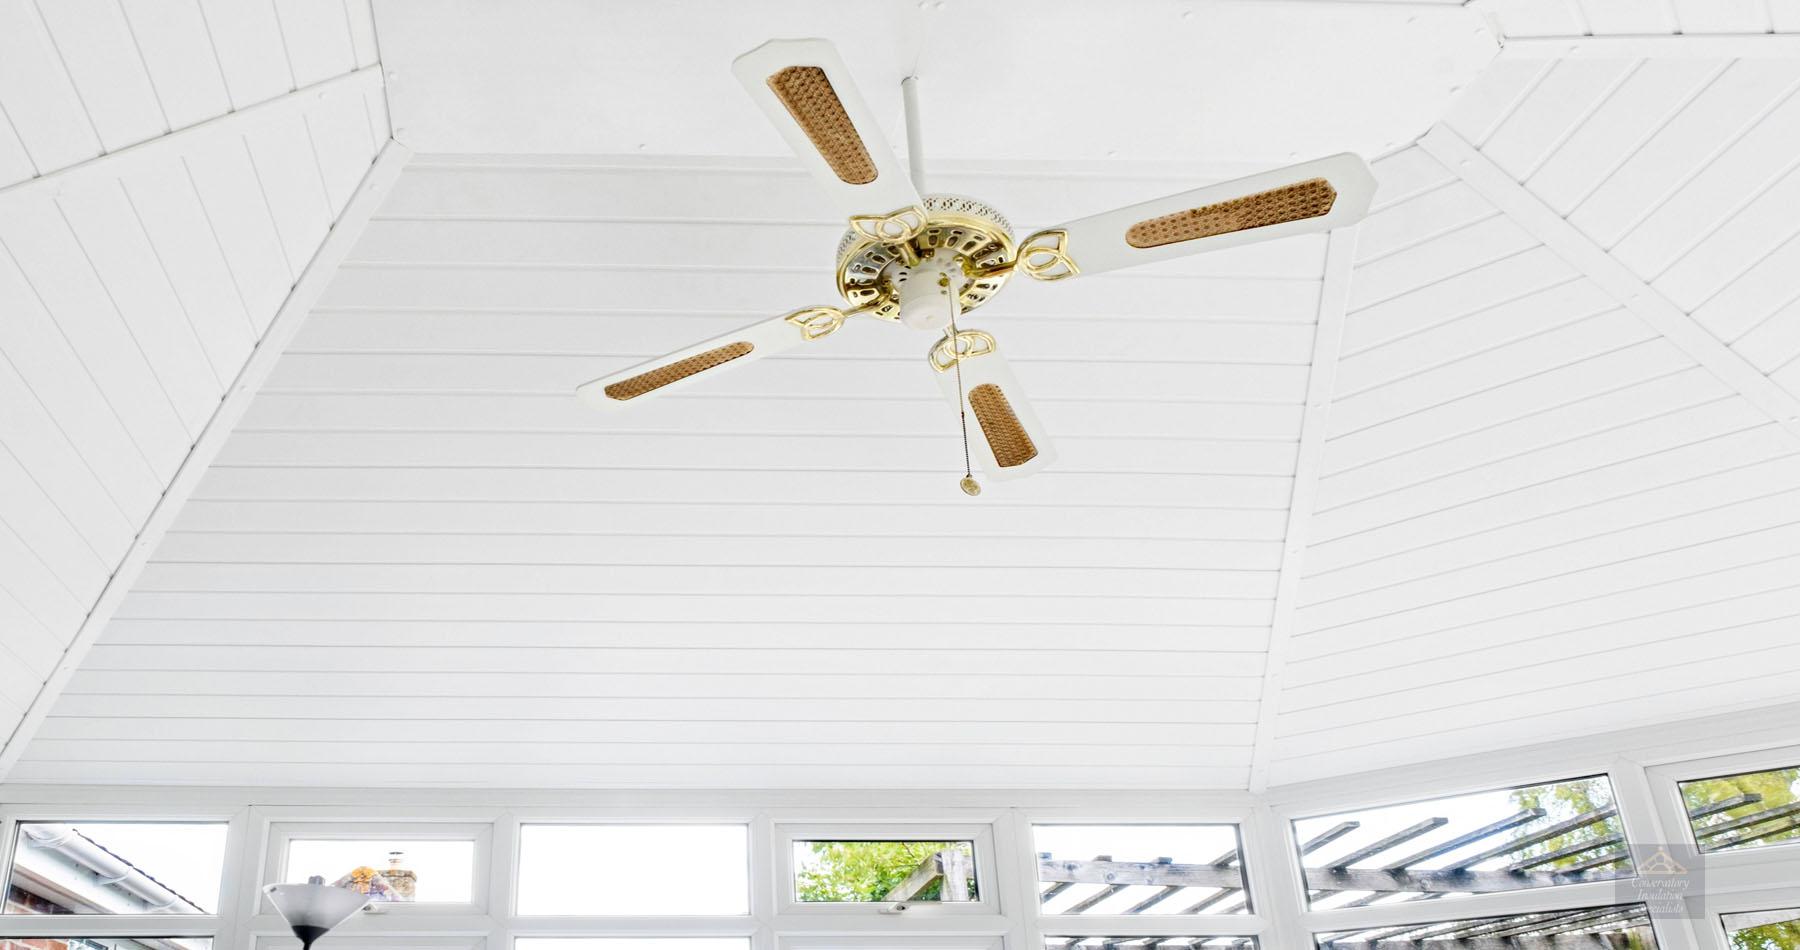 Conservatory insulation service